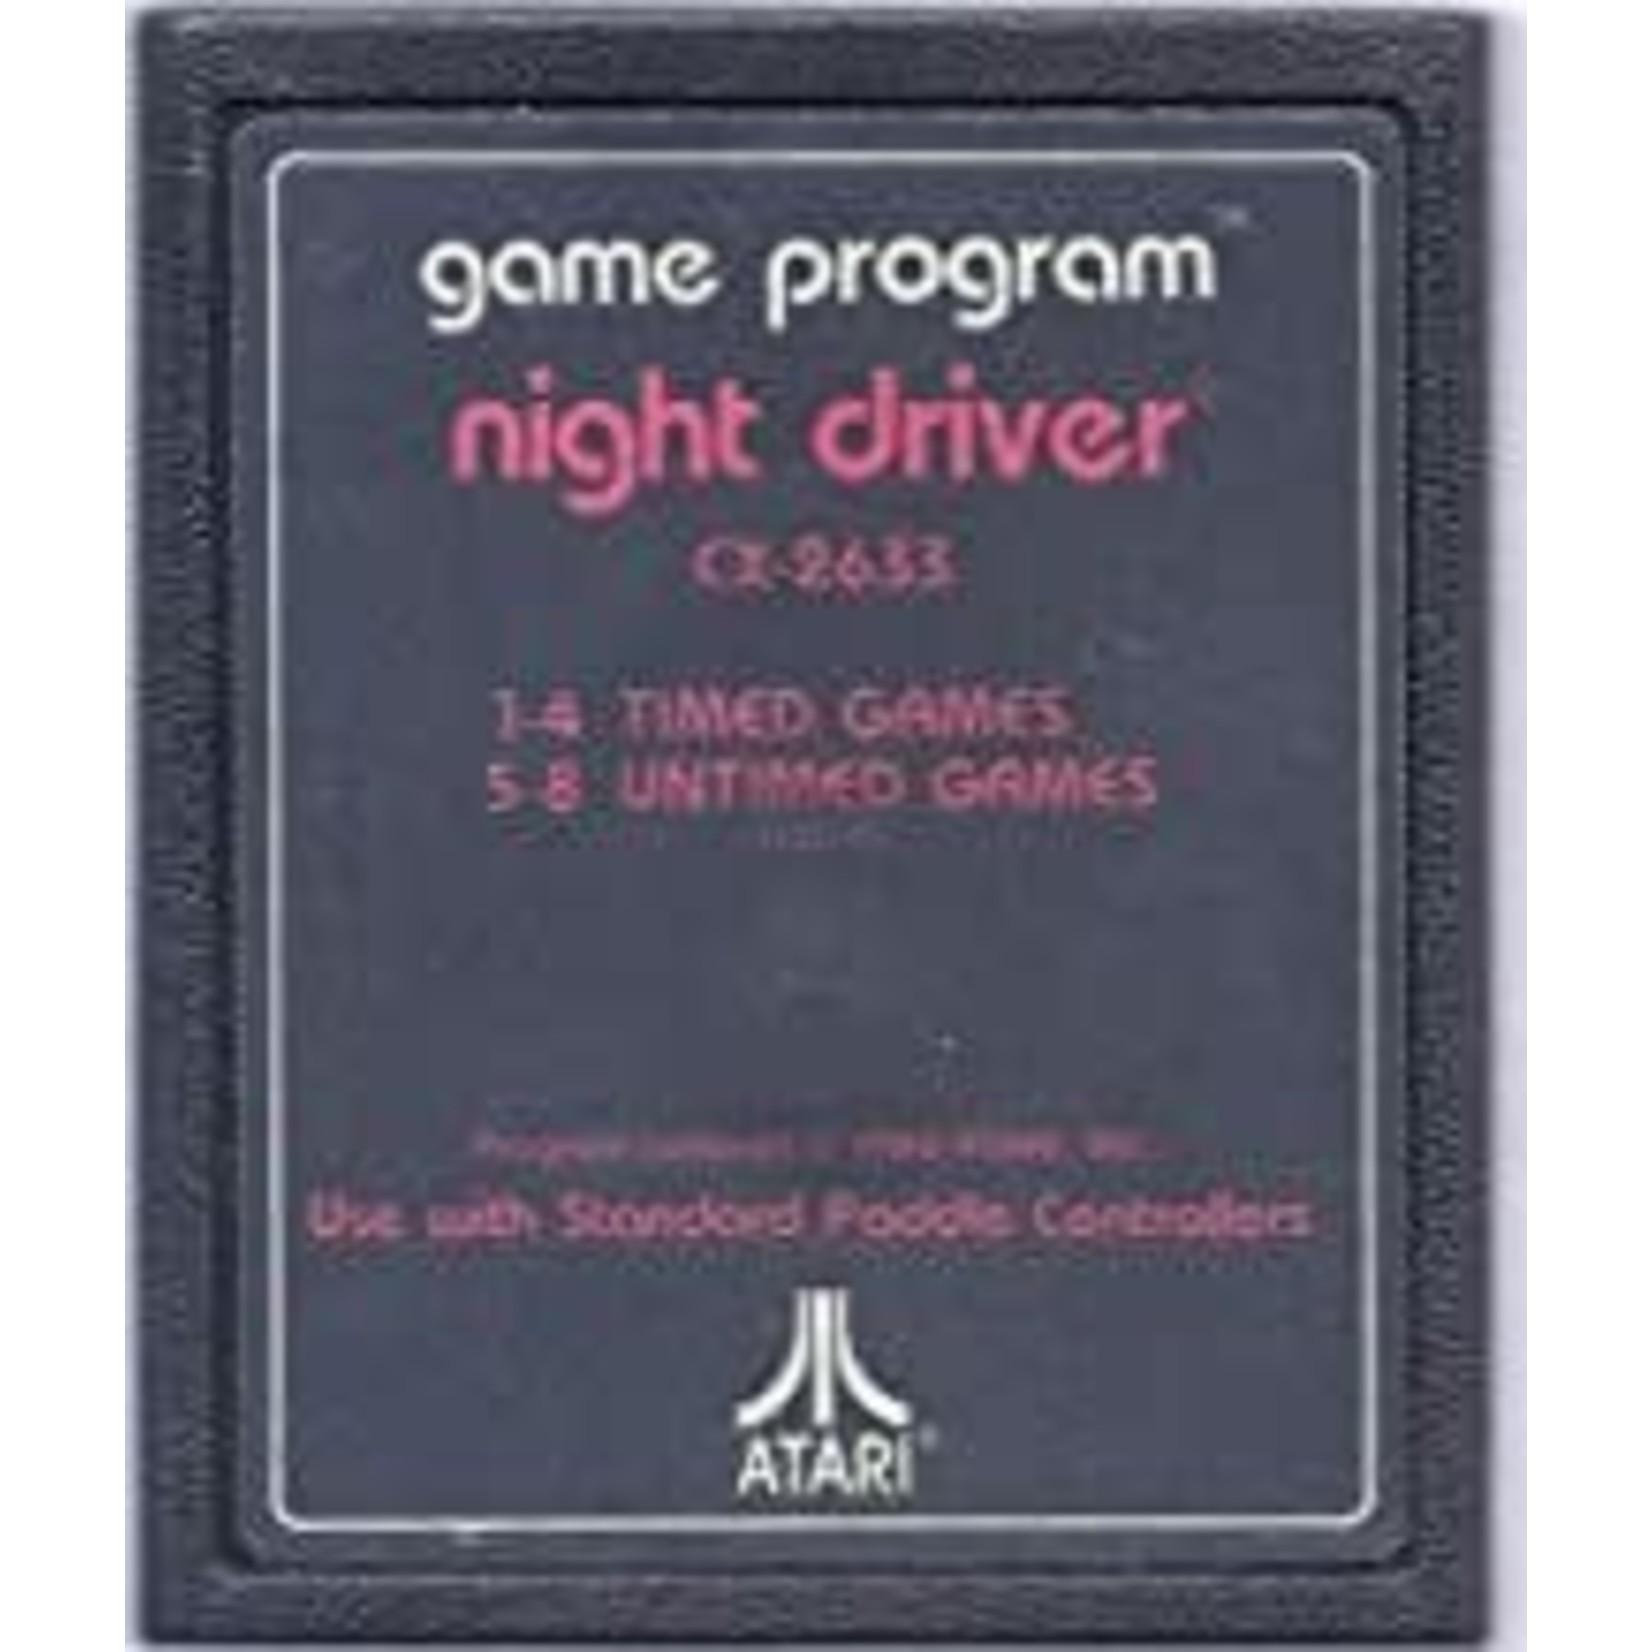 atariu-Night Driver [Tele Games] (cart only)